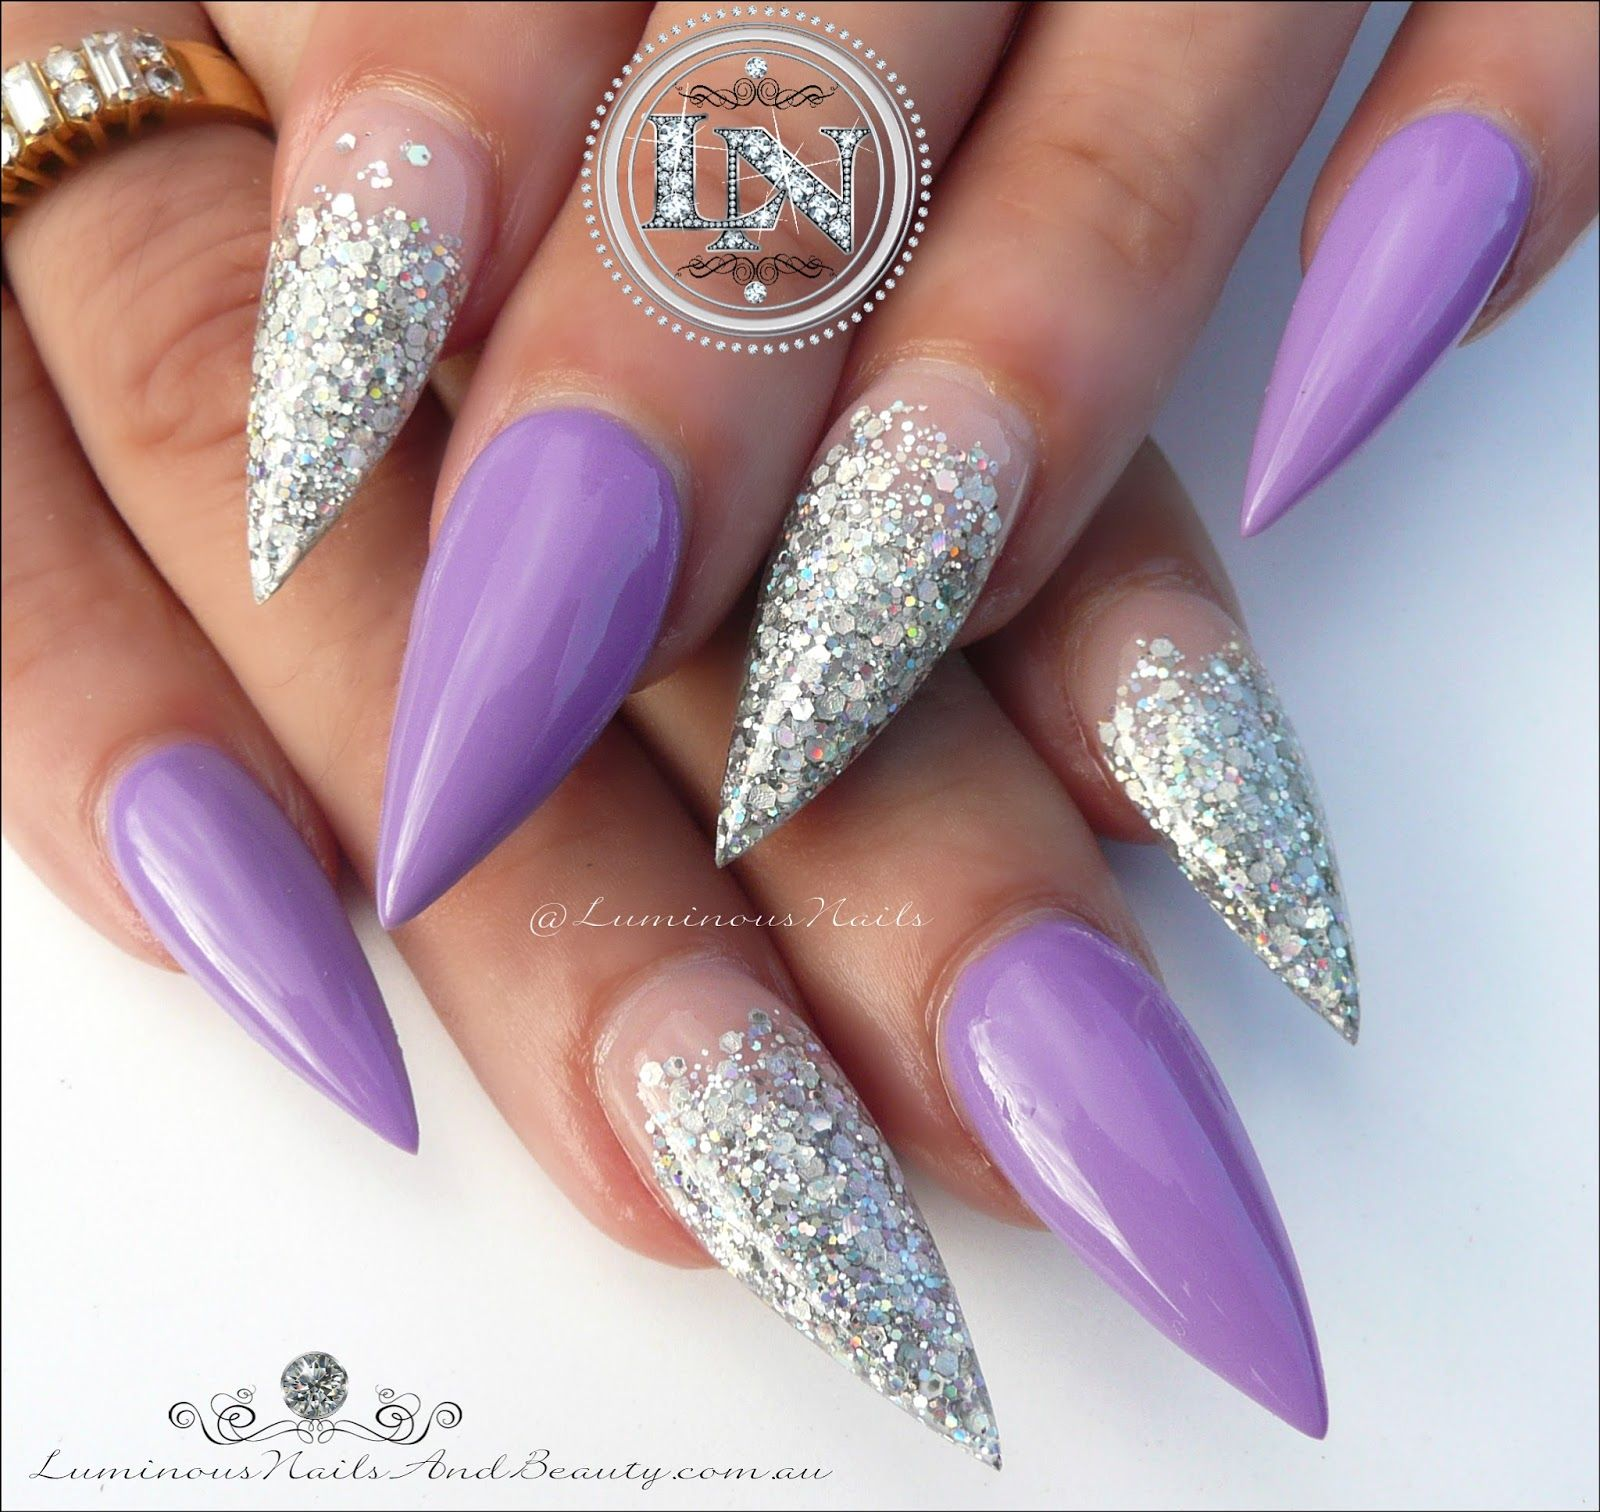 Stunning Purple Silver Sculptured Acrylic Gel Nails Gold Coast Australia